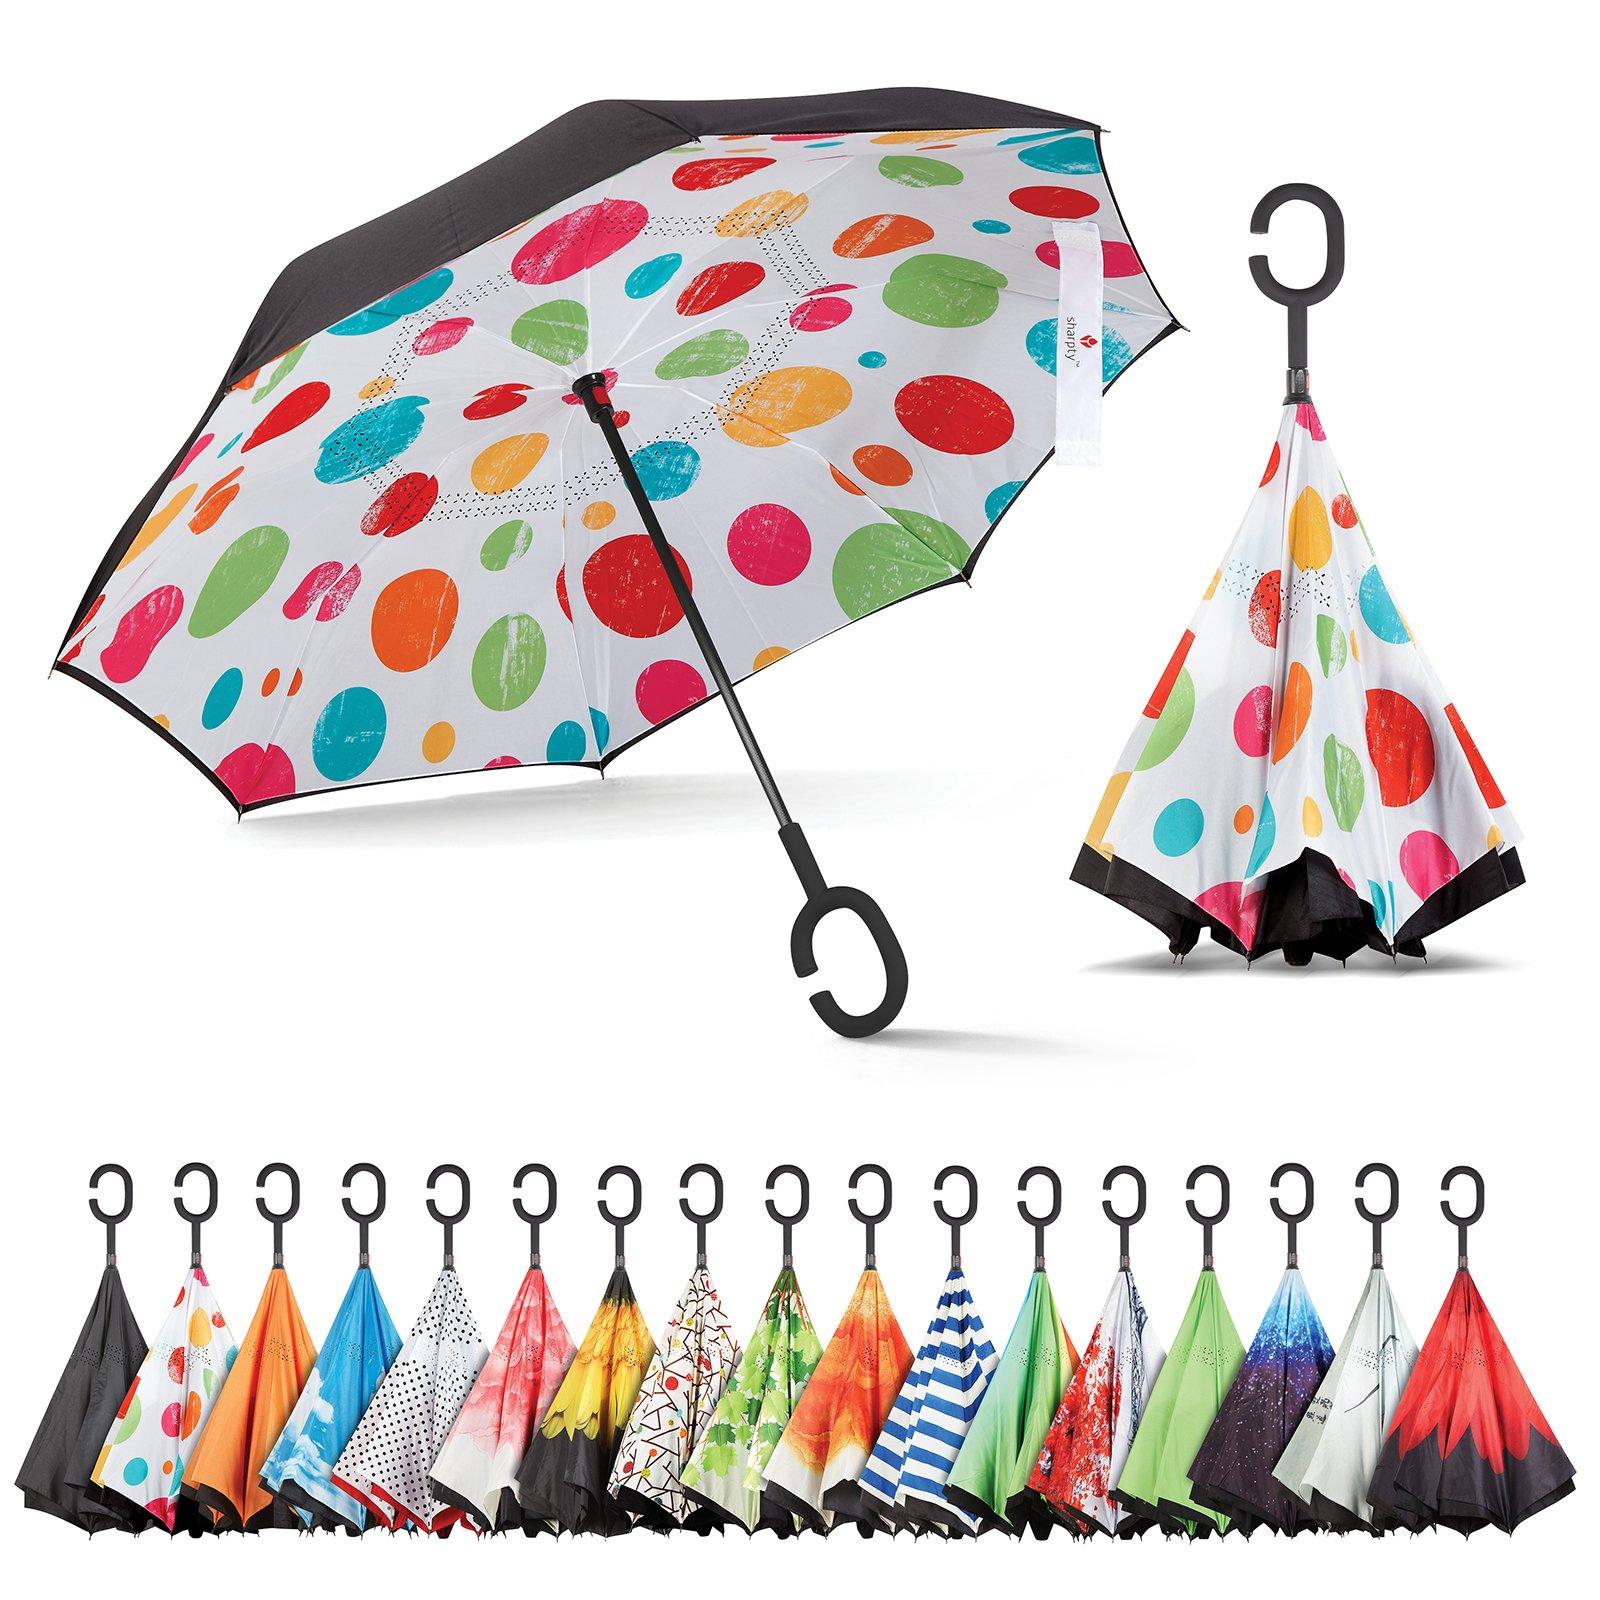 Sharpty Inverted Umbrella, Best Windproof Umbrella, Reverse Umbrella, Umbrella with UV Protection, Upside Down Umbrella with C-Shaped Handle (Polkadots)